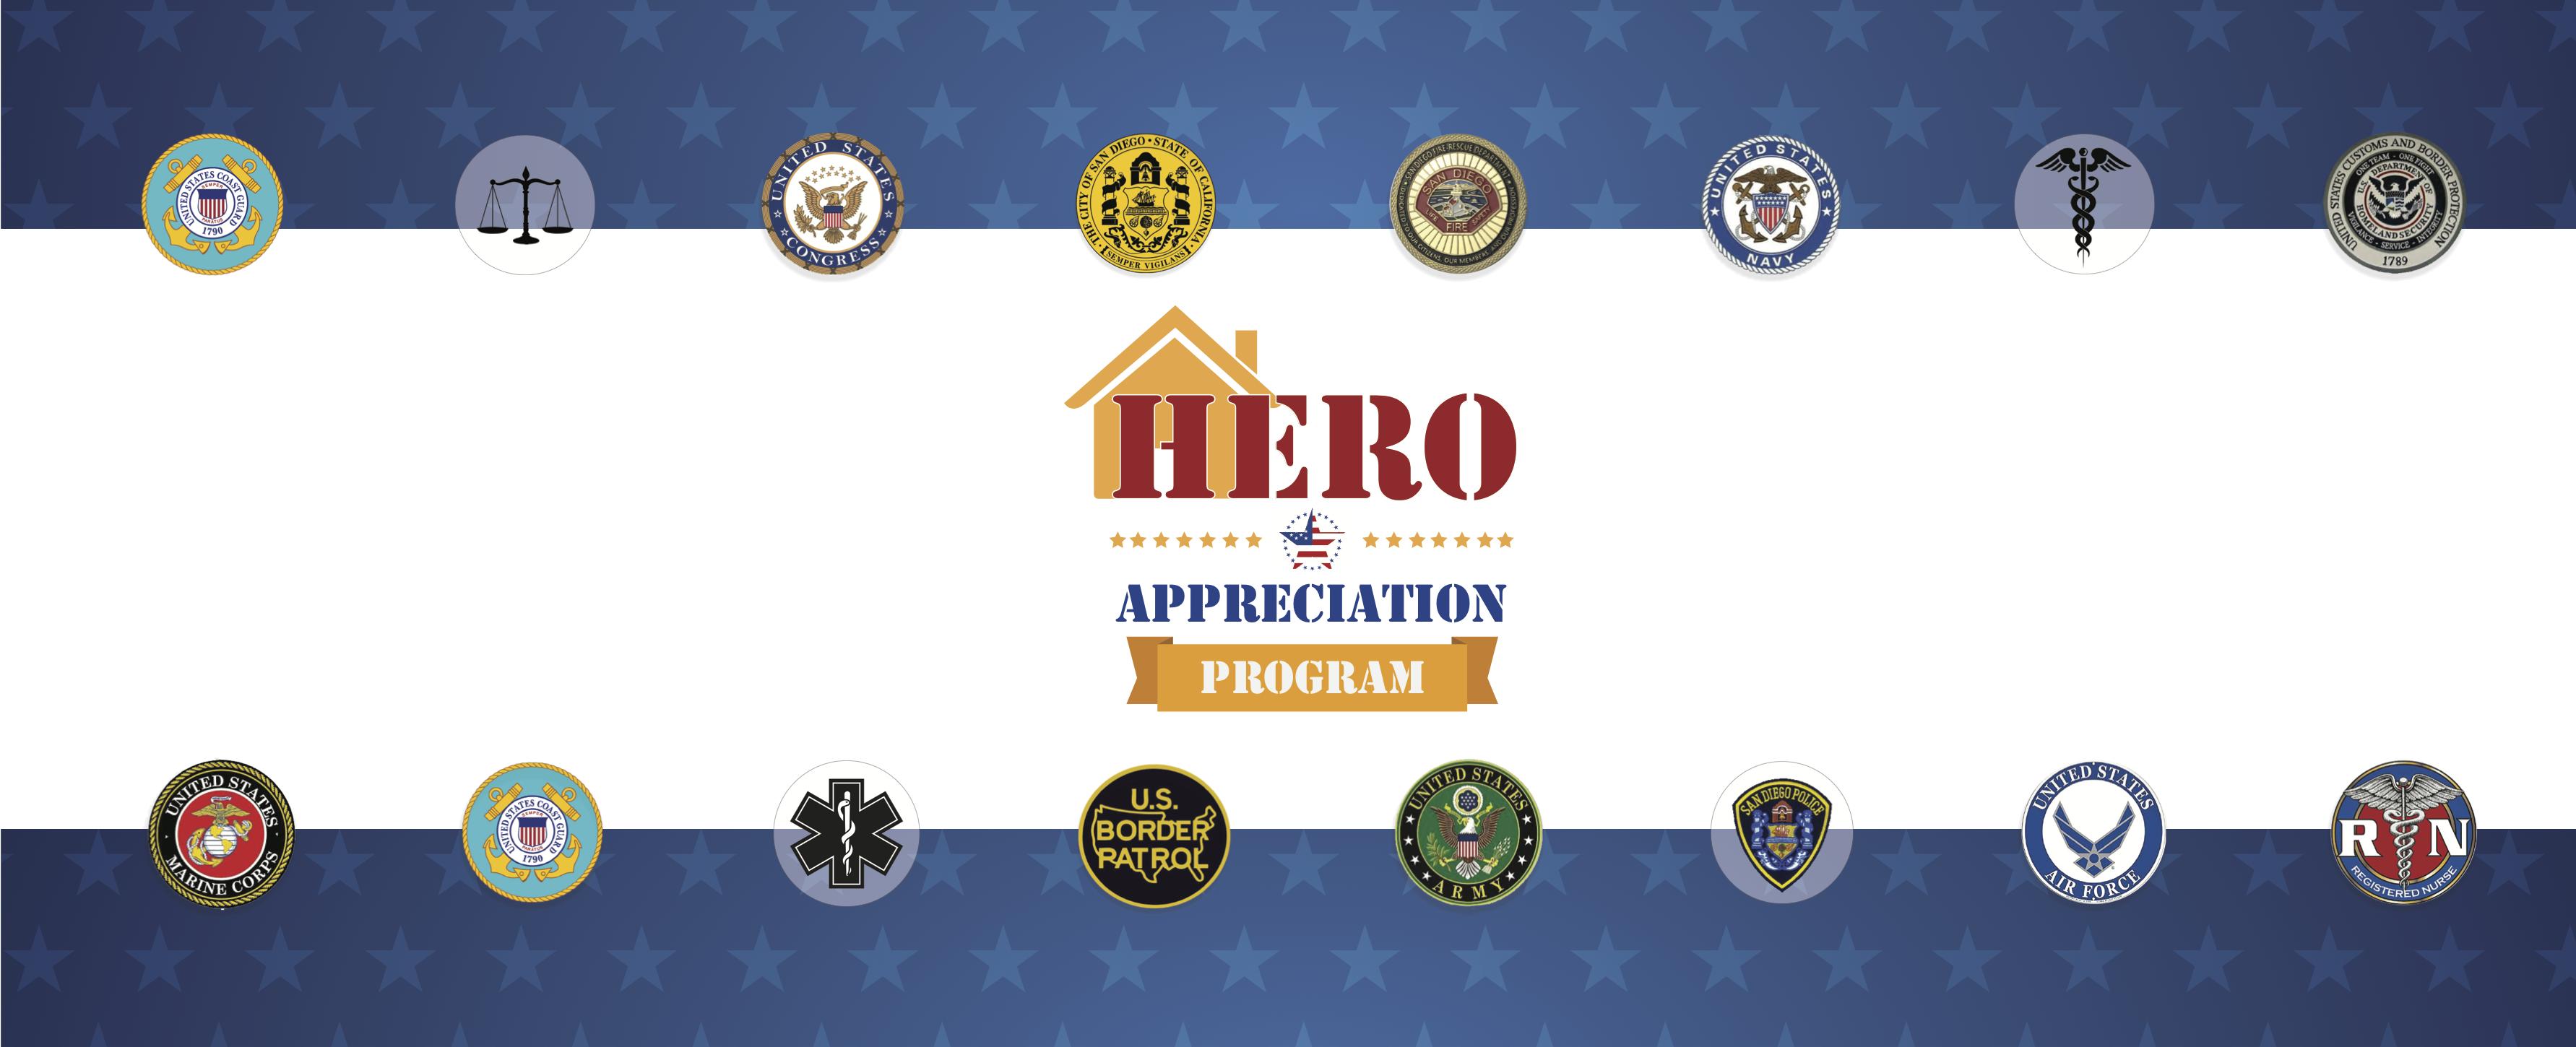 Hero Appreciation Program Cover Photo-final.png